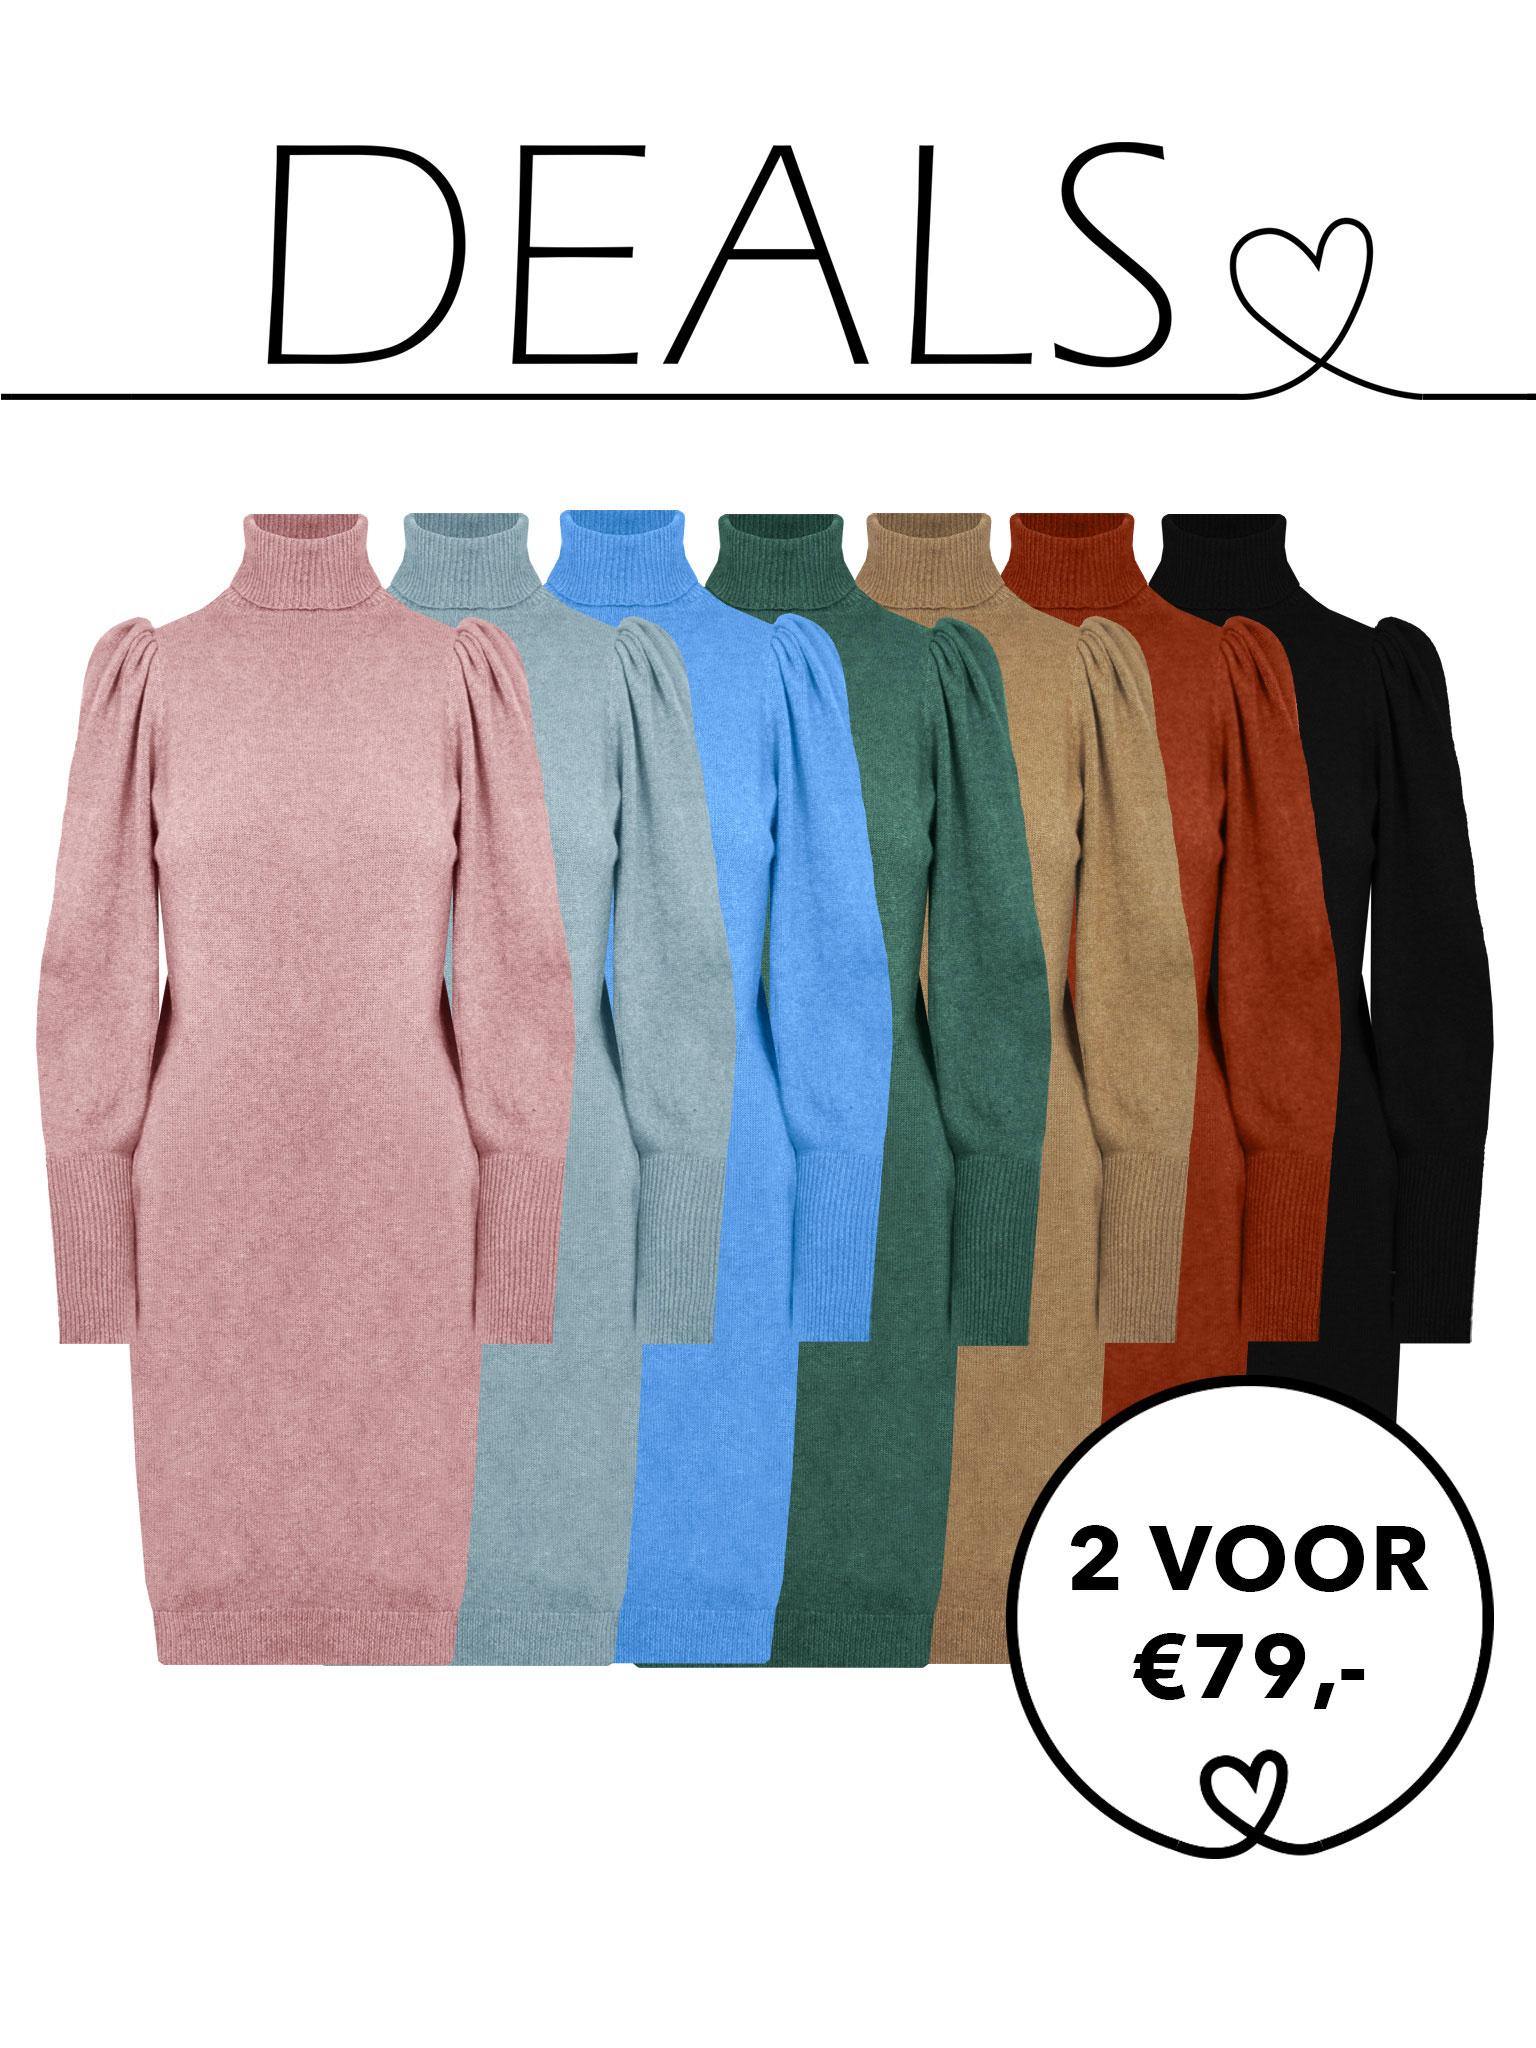 Blushfashionstore.nl – Deal pagina